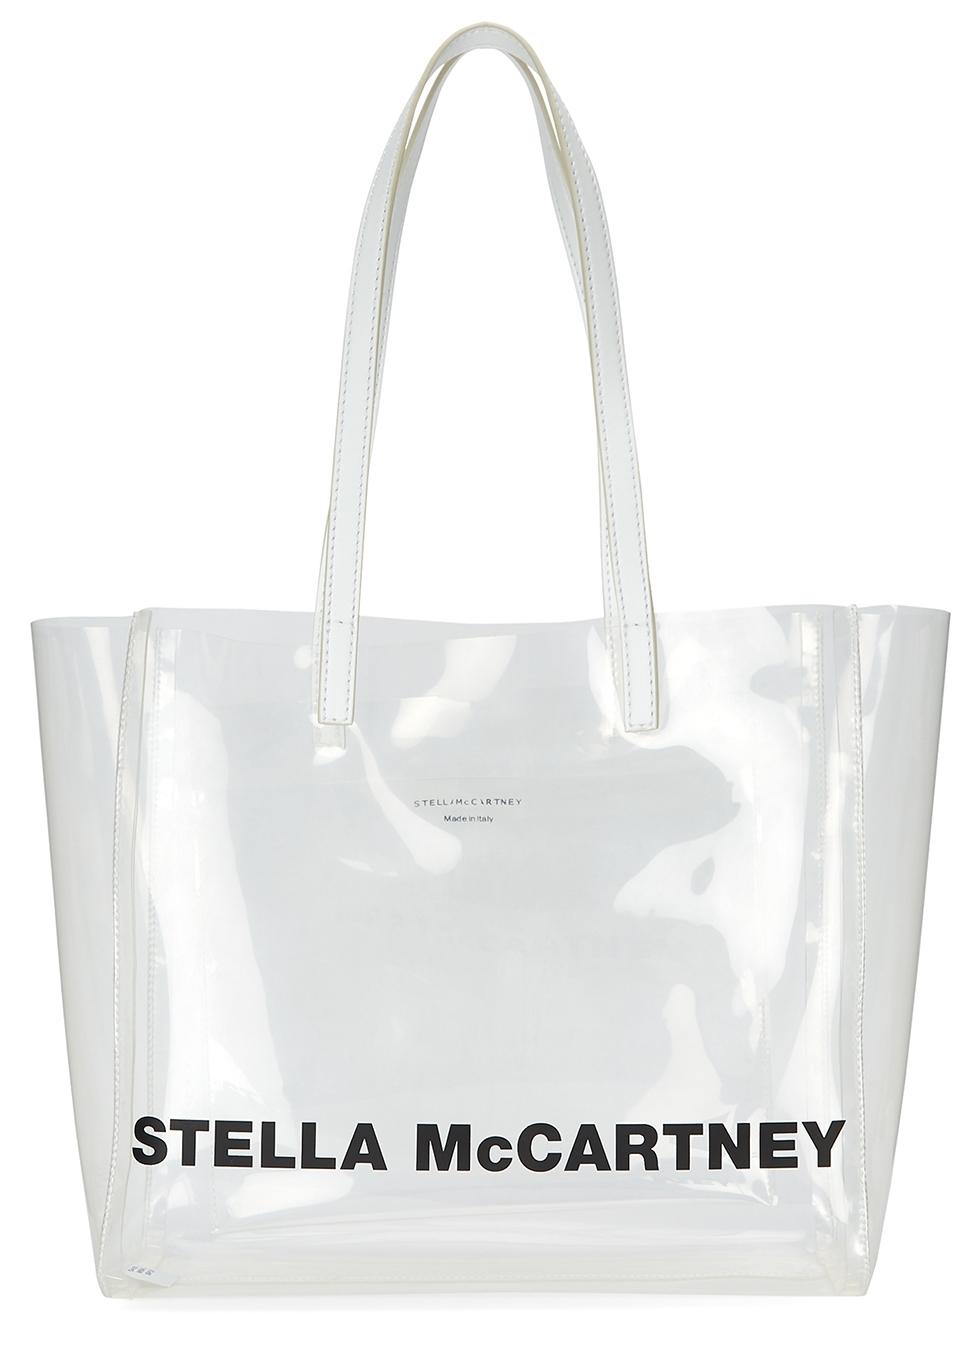 Stella McCartney Bags - Womens - Harvey Nichols 9b3cb9cb0a